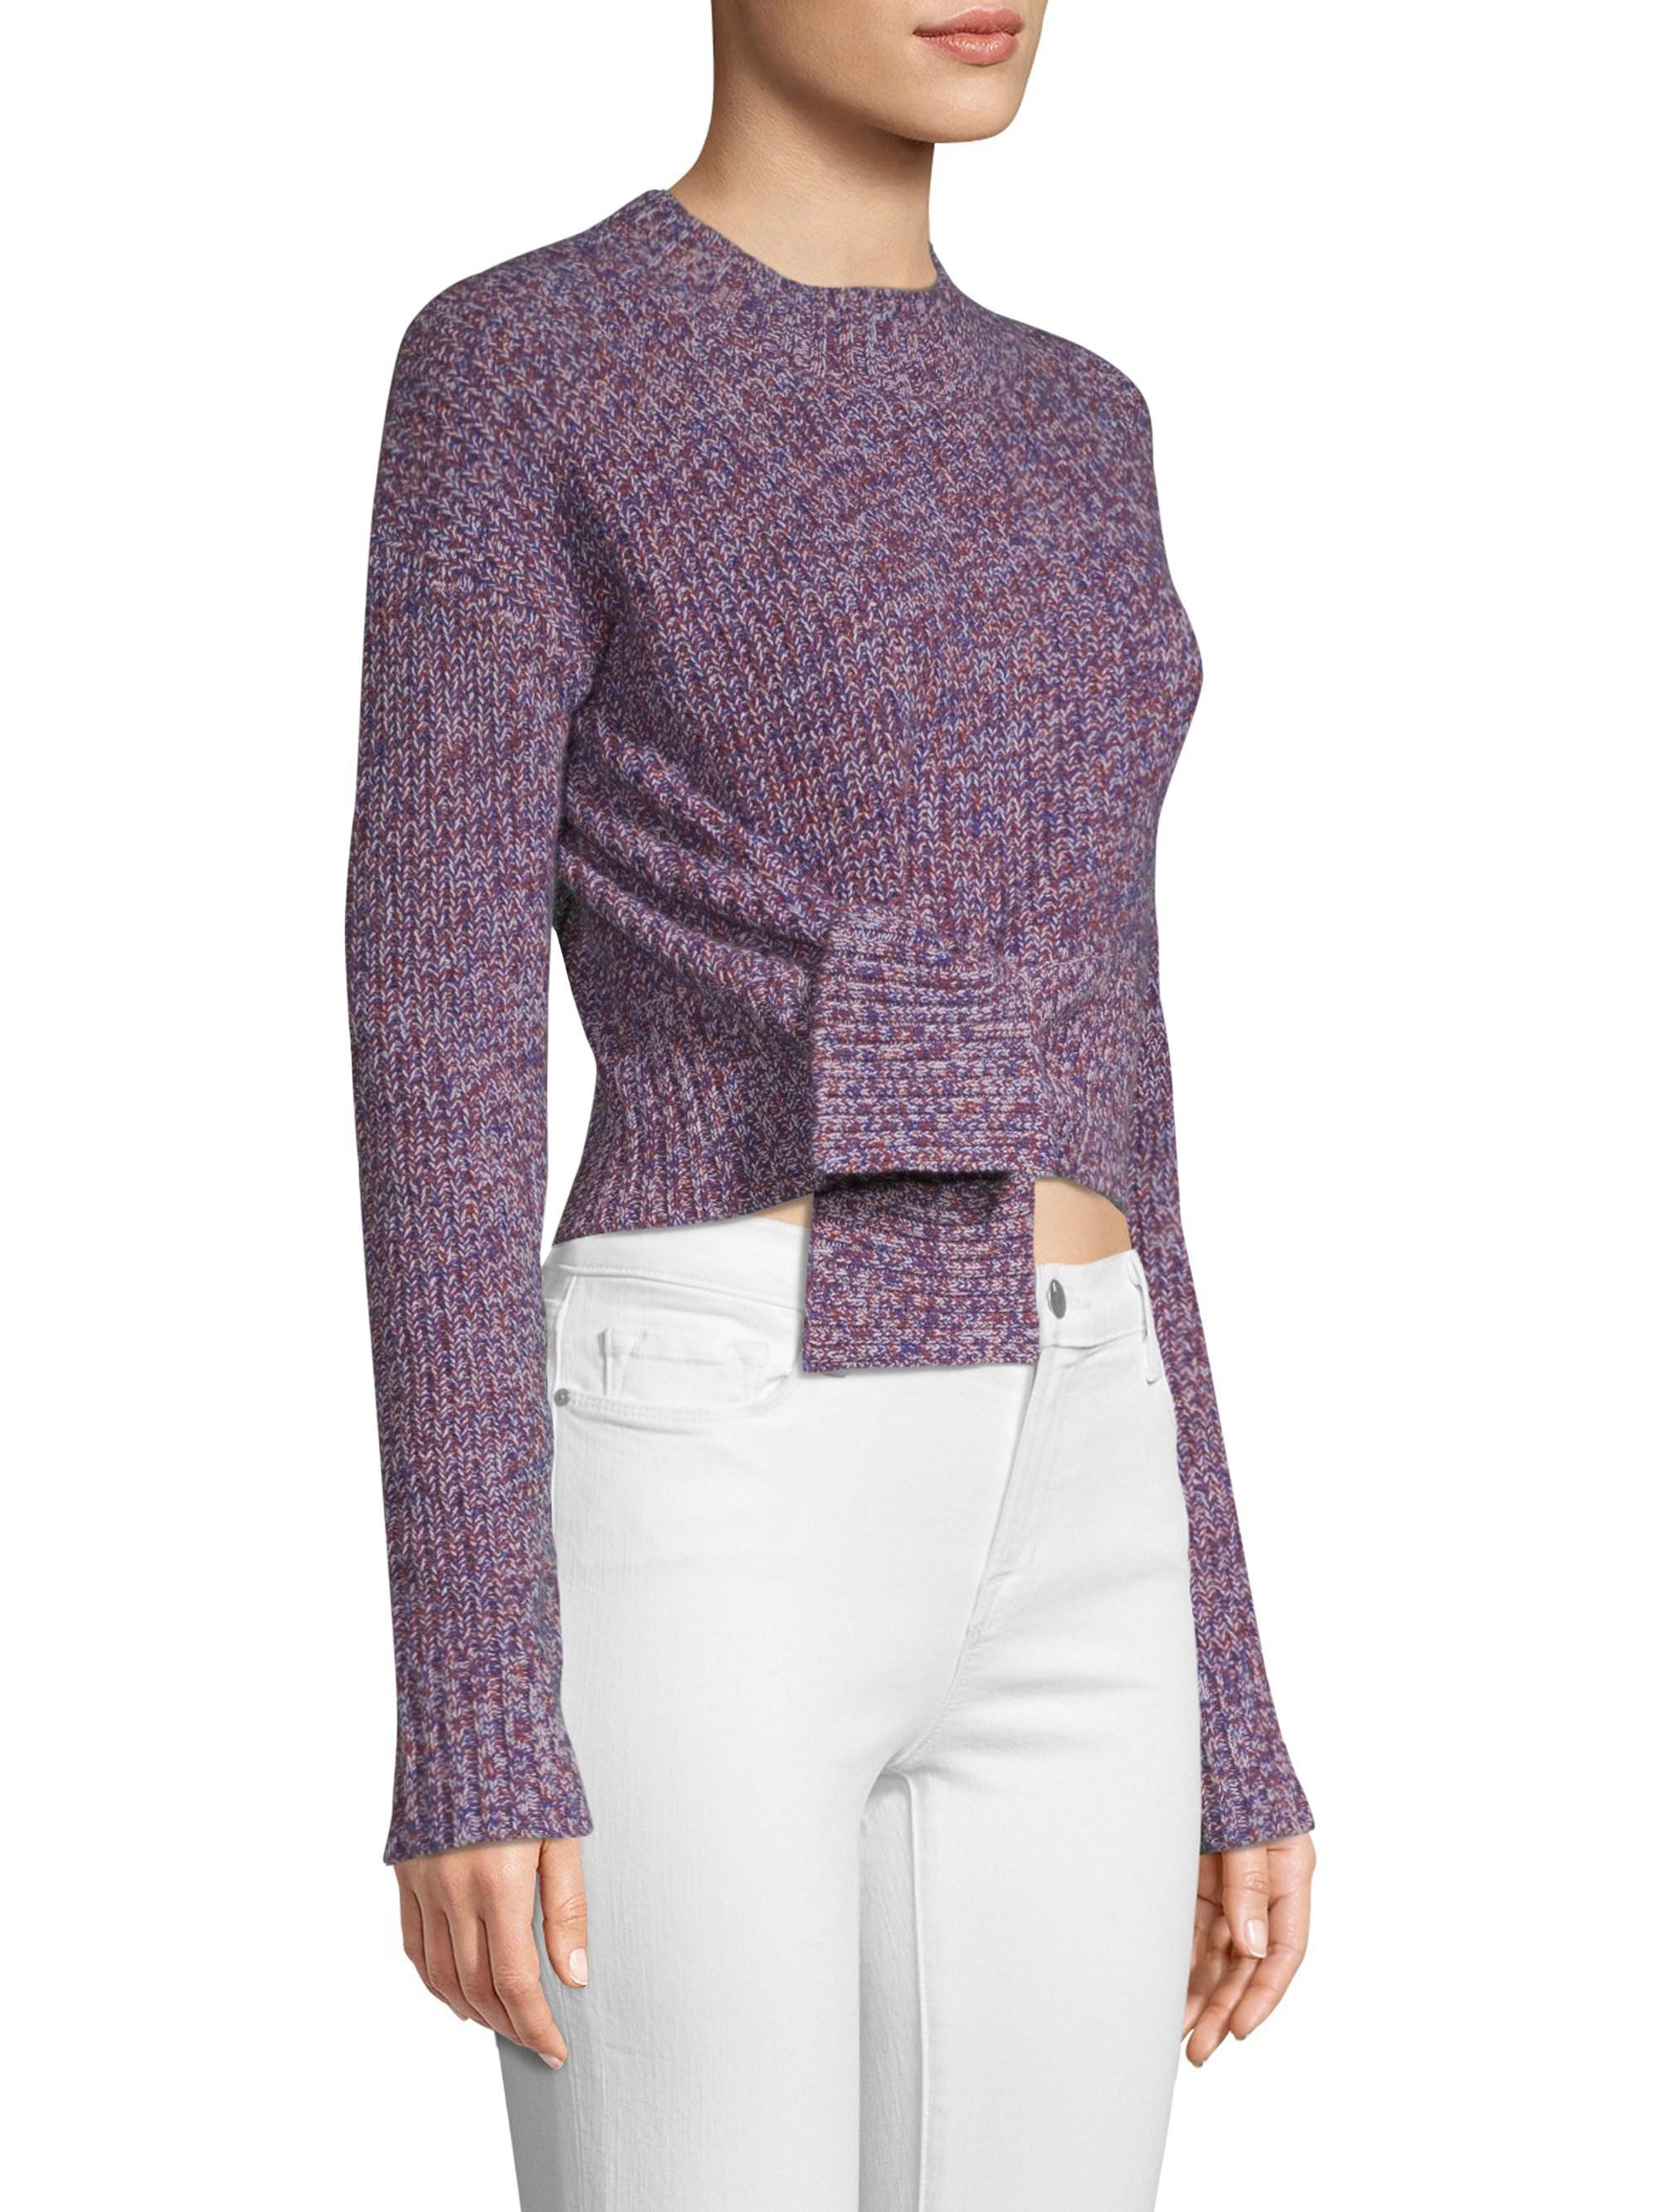 1c5eb526c3752f Zoe Jordan Foreman Cashmere   Wool Sweater in Purple - Lyst